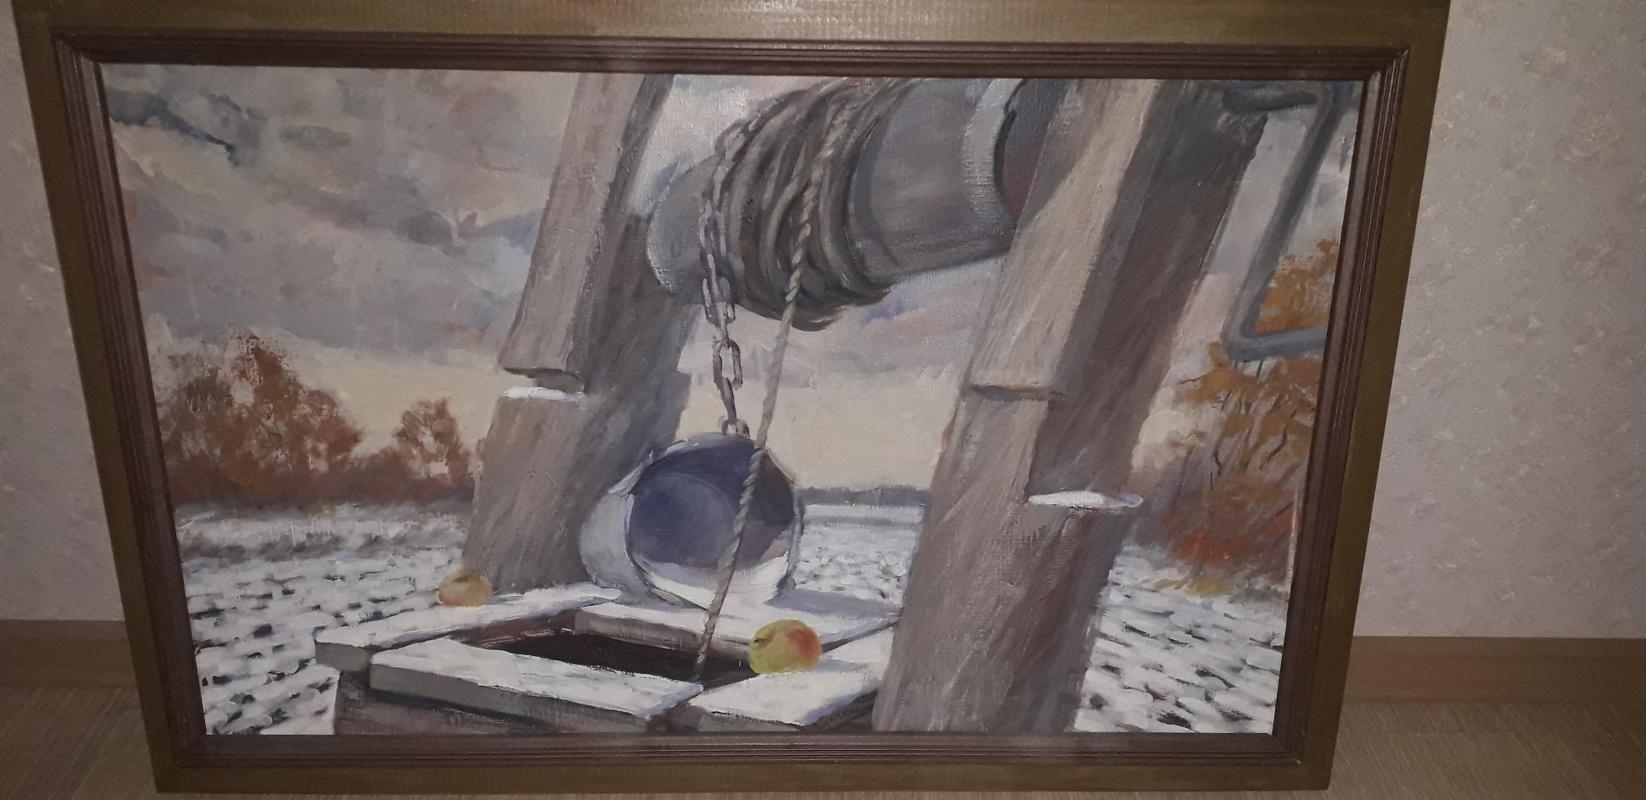 V.A. Kuritsyn. Old well